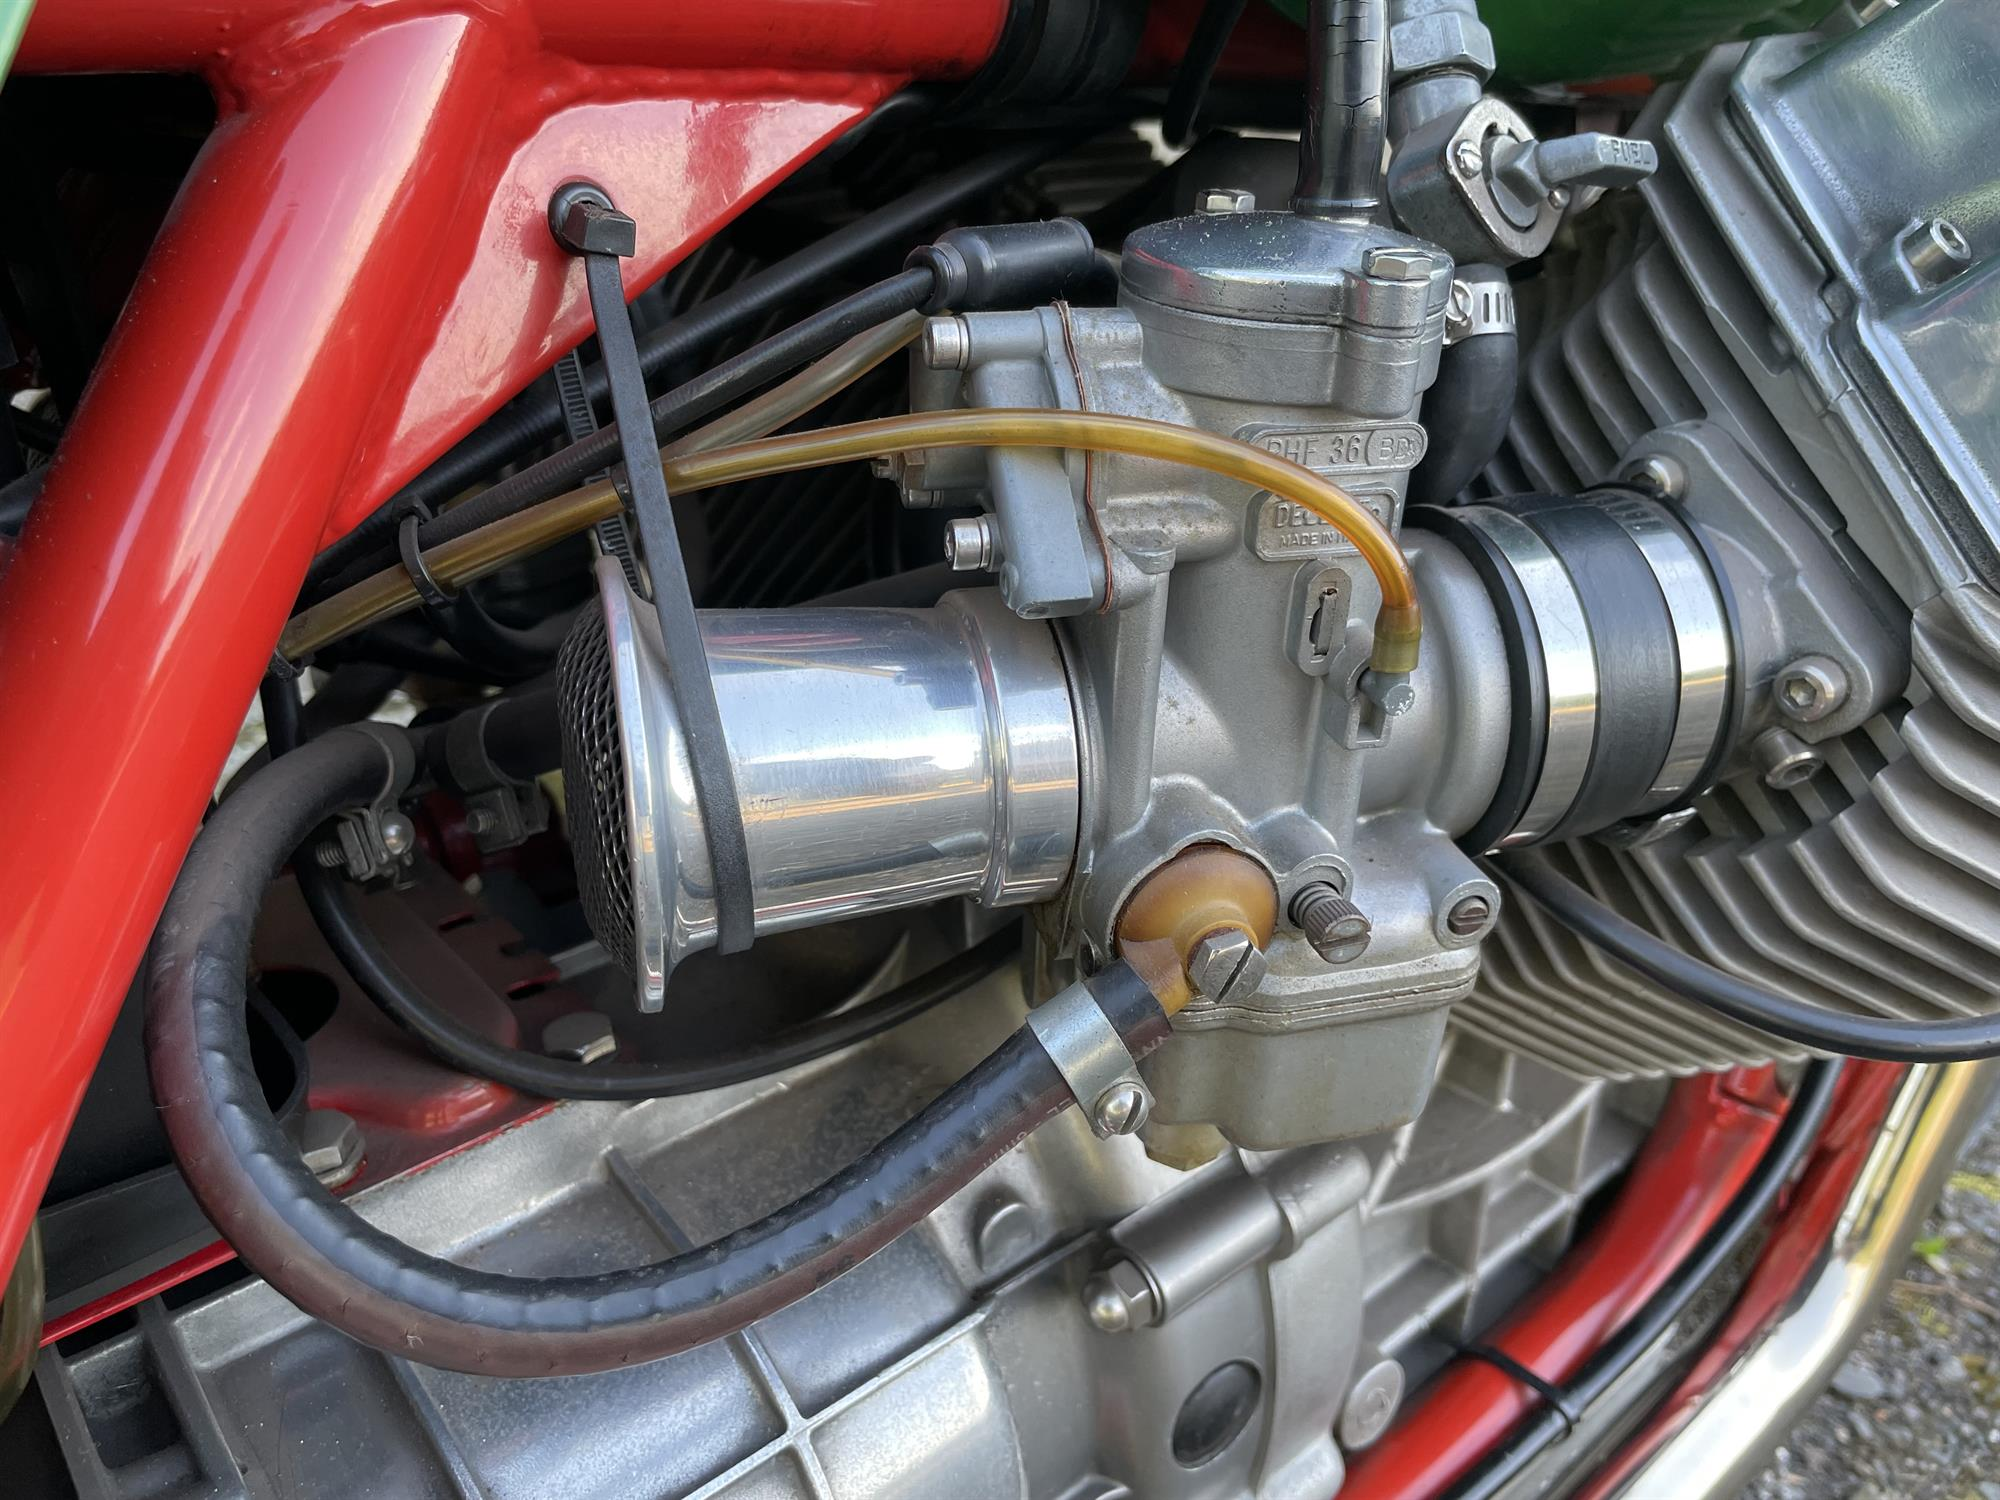 1983 Moto Guzzi 850 Le Mans III - Image 9 of 10